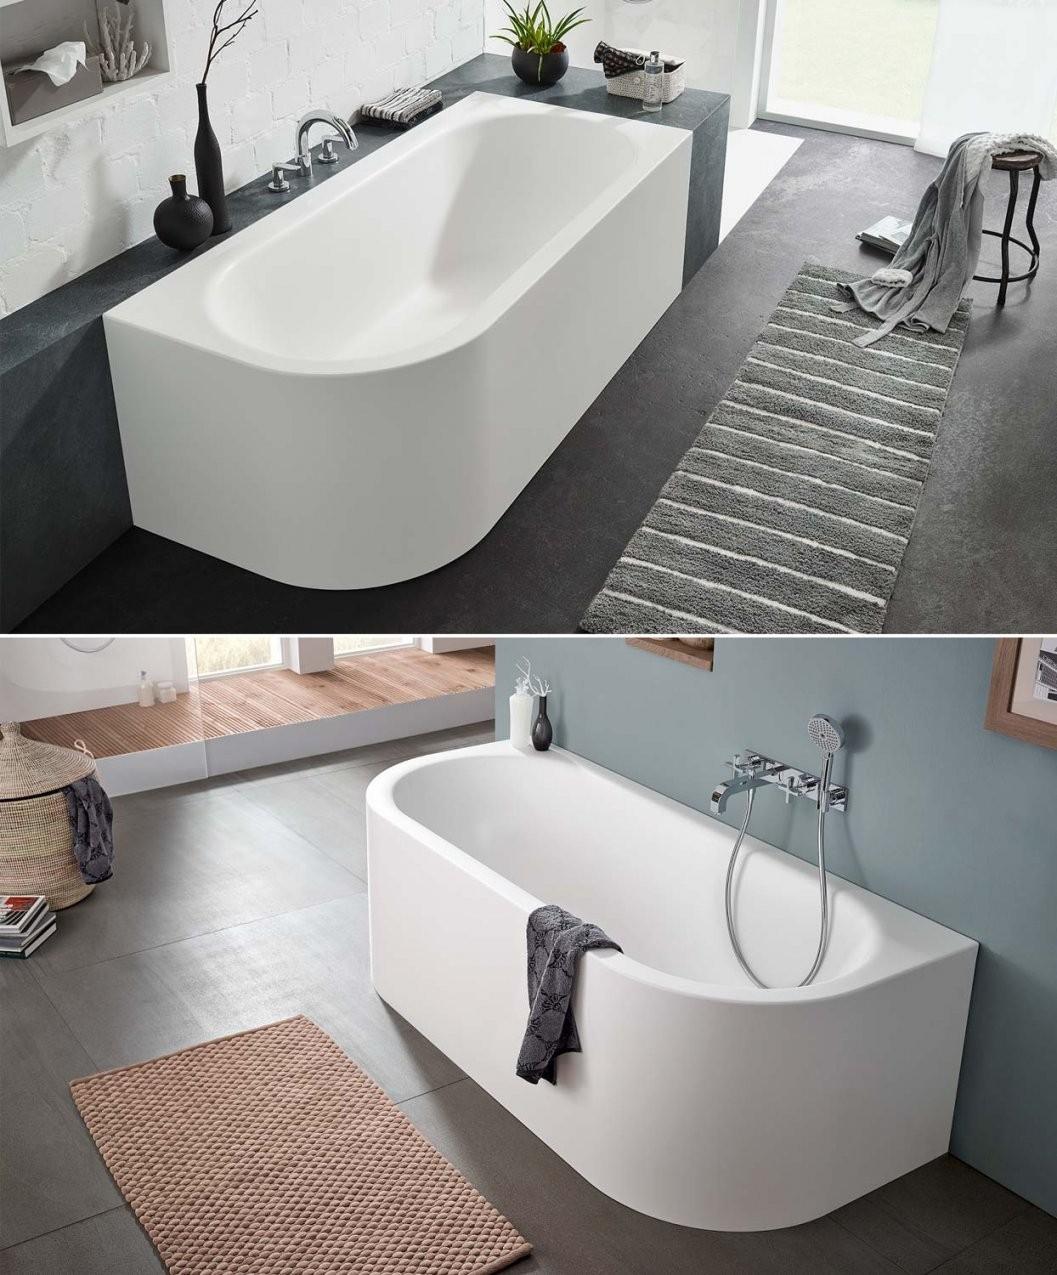 Ovale Freistehende Badewanne Mauersberger Mineralwannen Erleben von Ovale Freistehende Badewanne Photo